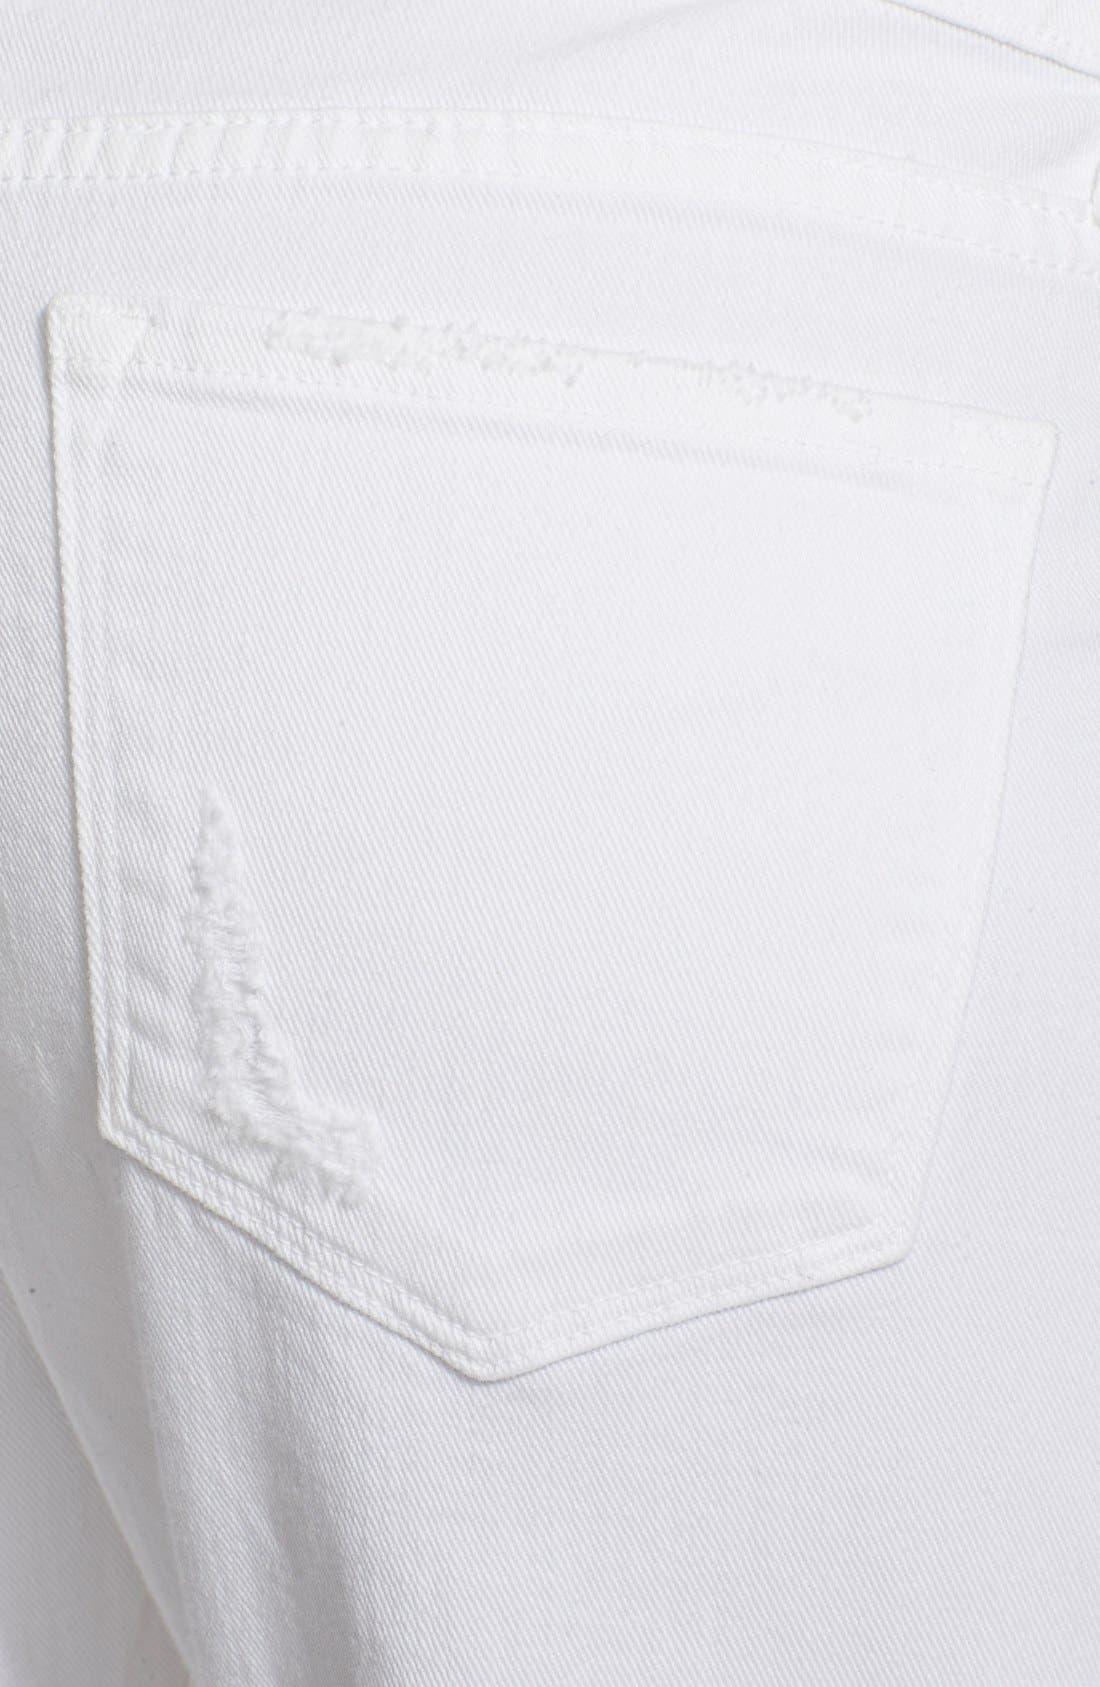 Alternate Image 3  - Frame Denim 'Le Garcon' Destroyed Slim Boyfriend Jeans (Rip Blanc)